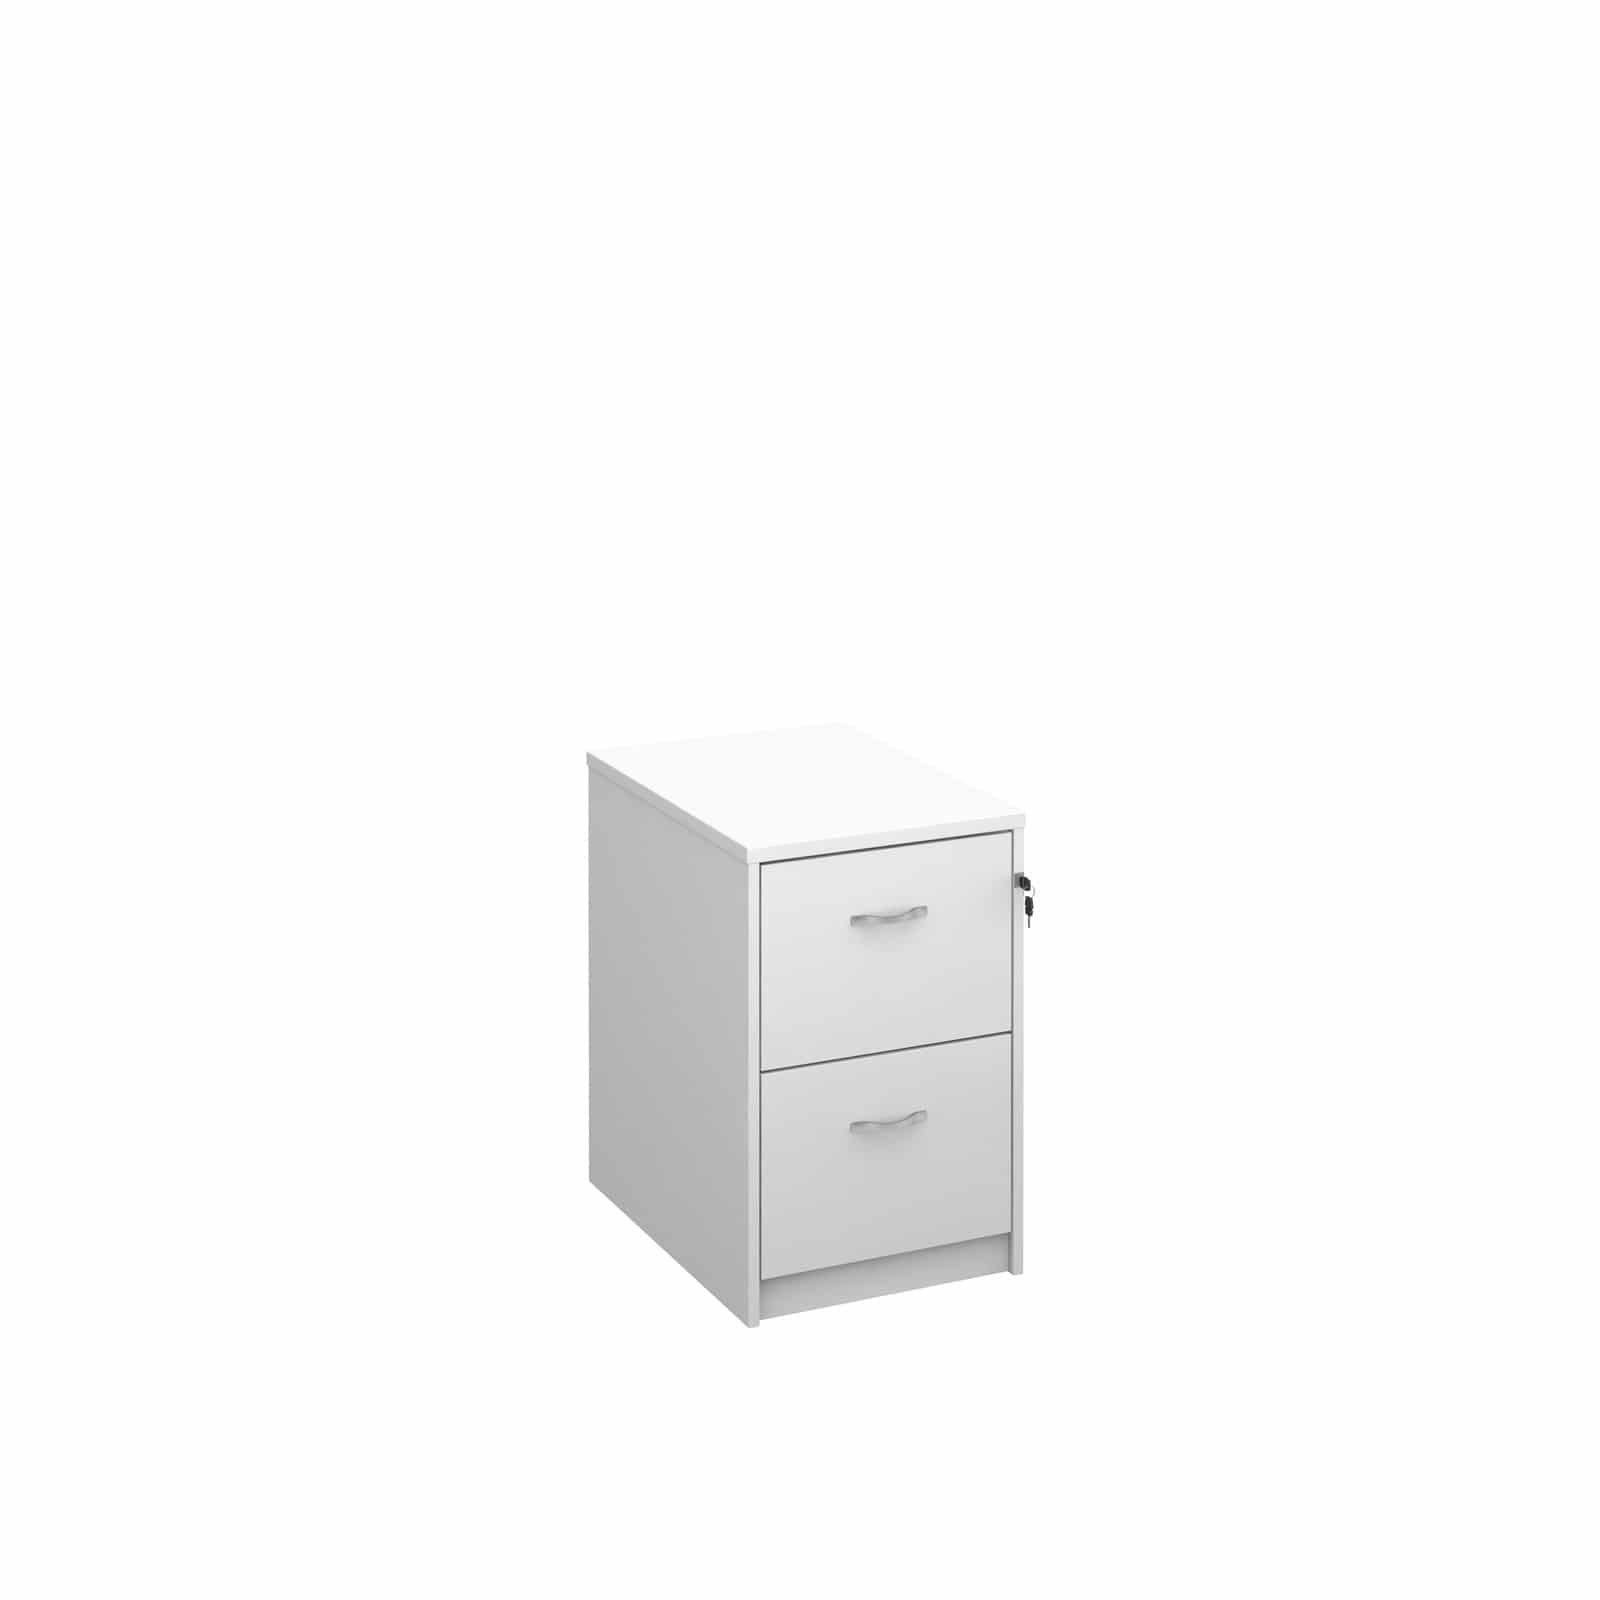 Bimi Ready Built 2 Draw Lockable Wood Filing Cabinet White